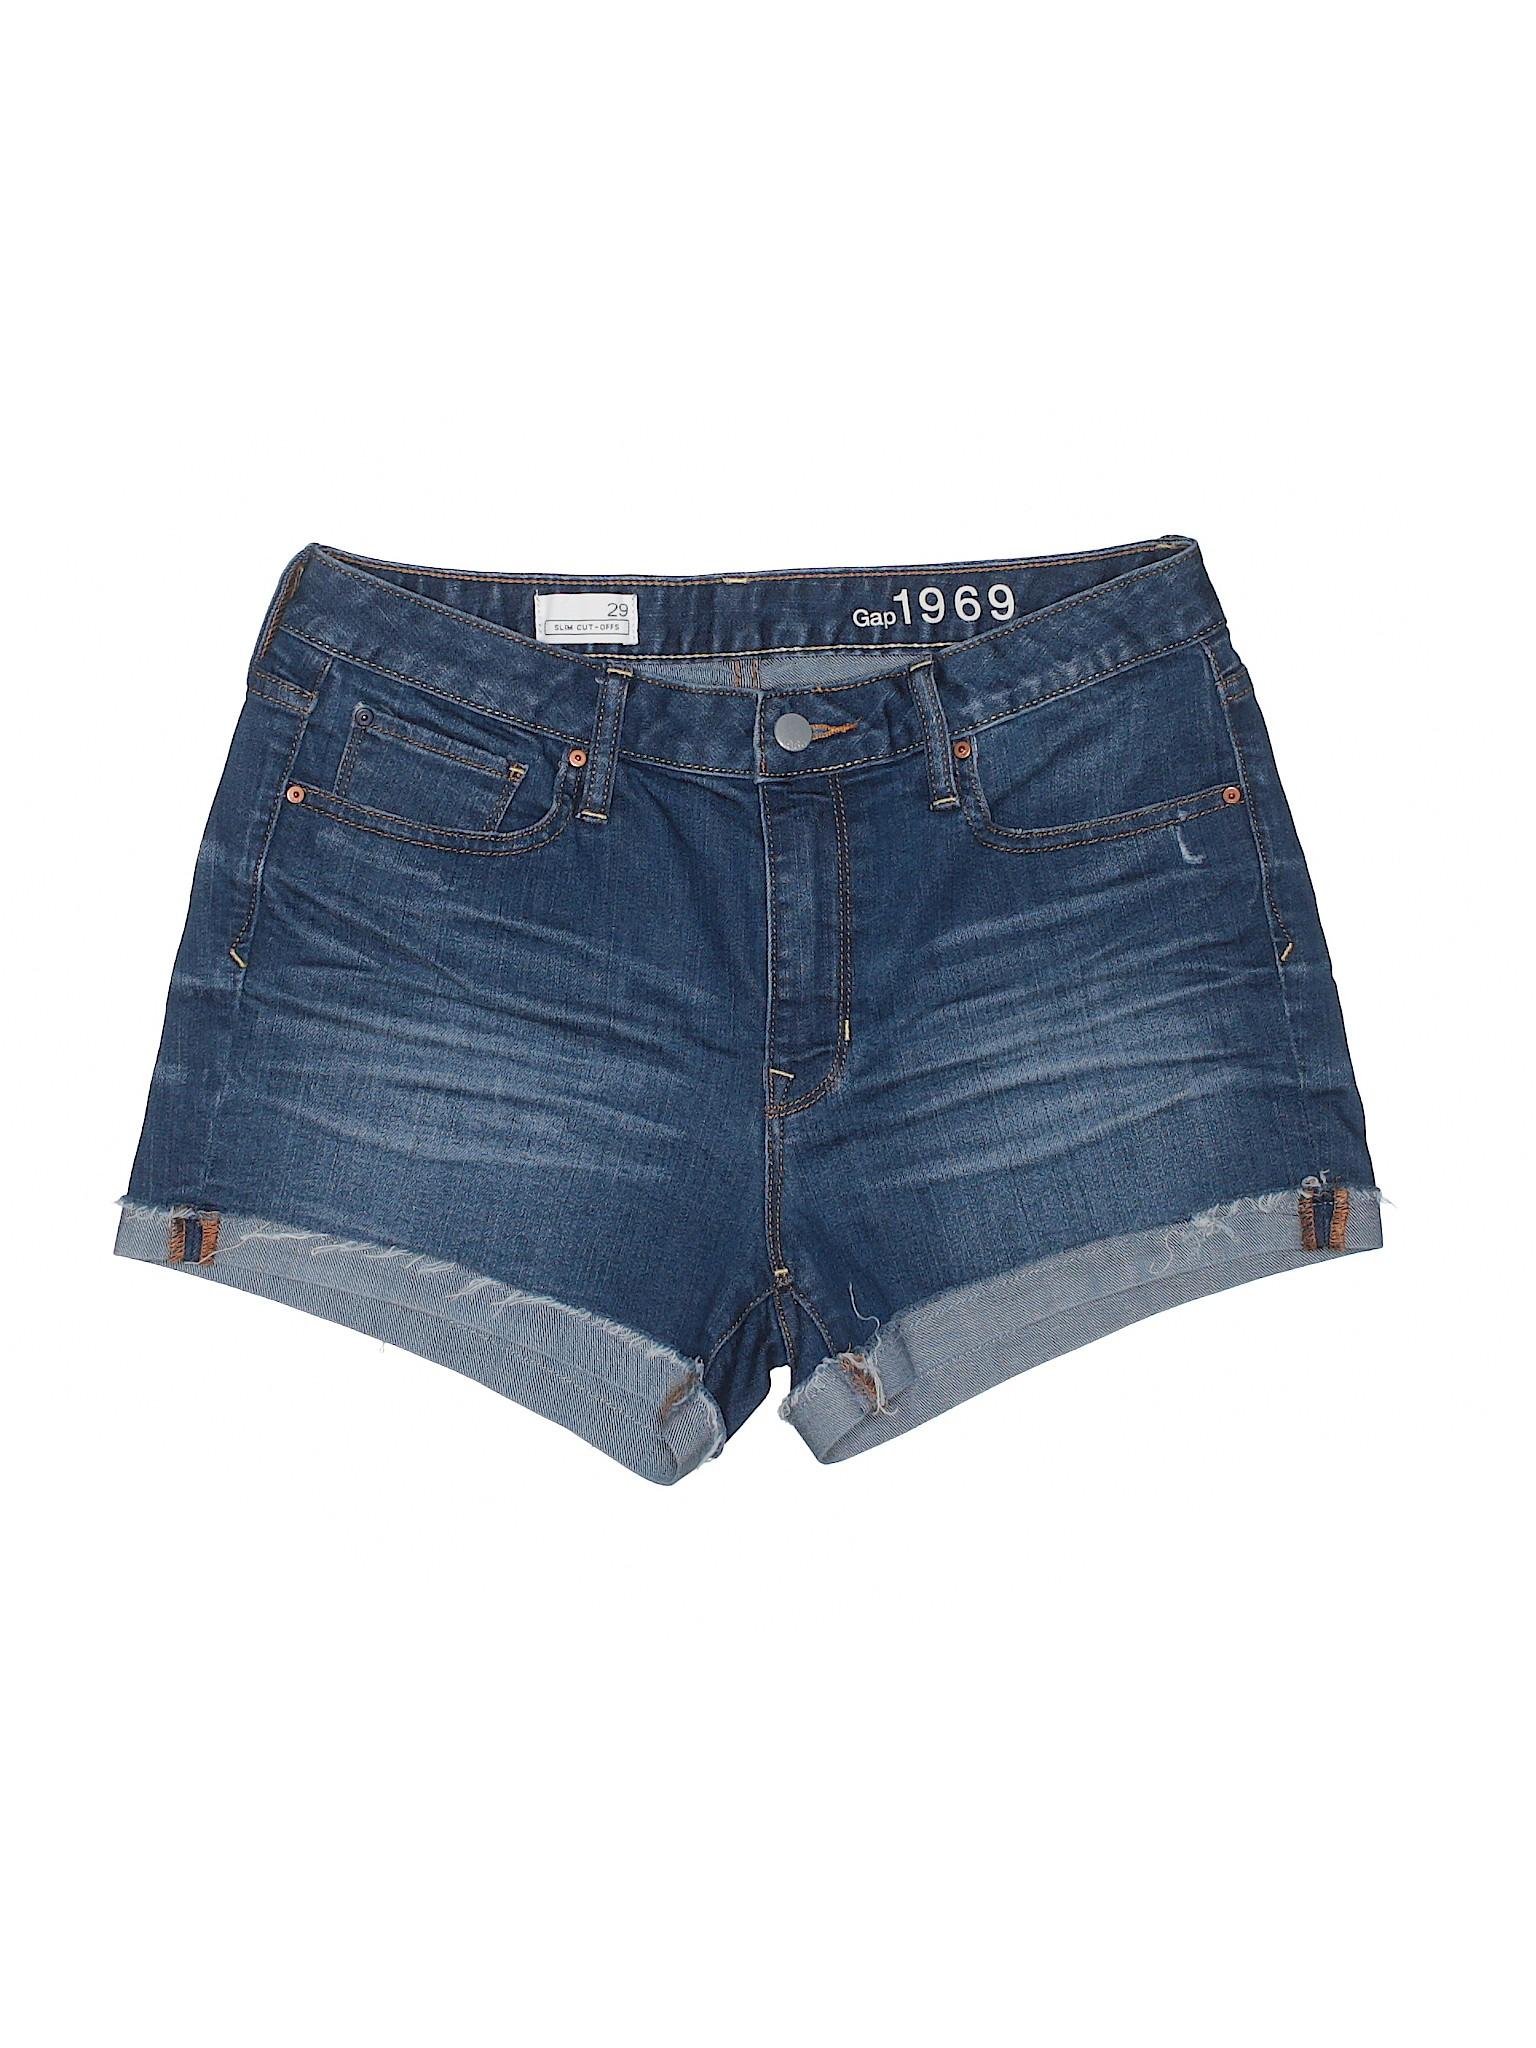 Boutique Gap Boutique Shorts Gap Boutique Shorts Denim Gap Denim TnxIWPBn